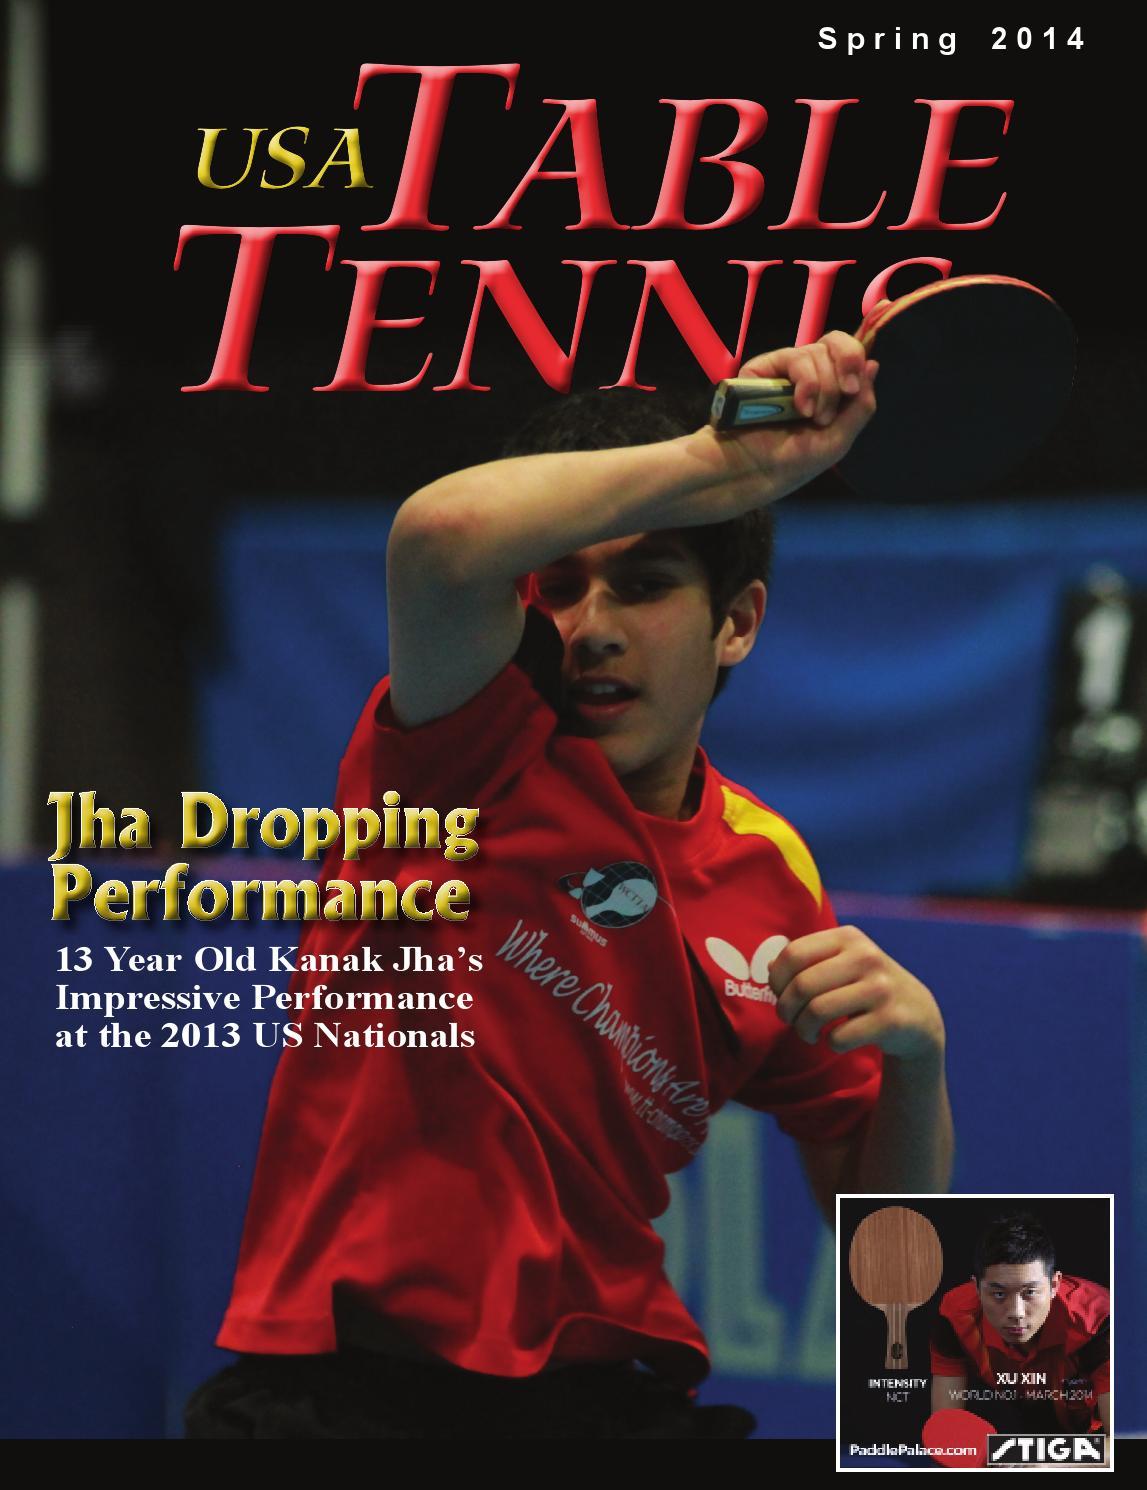 pics Leah Neuberger 29x US table tennis champion